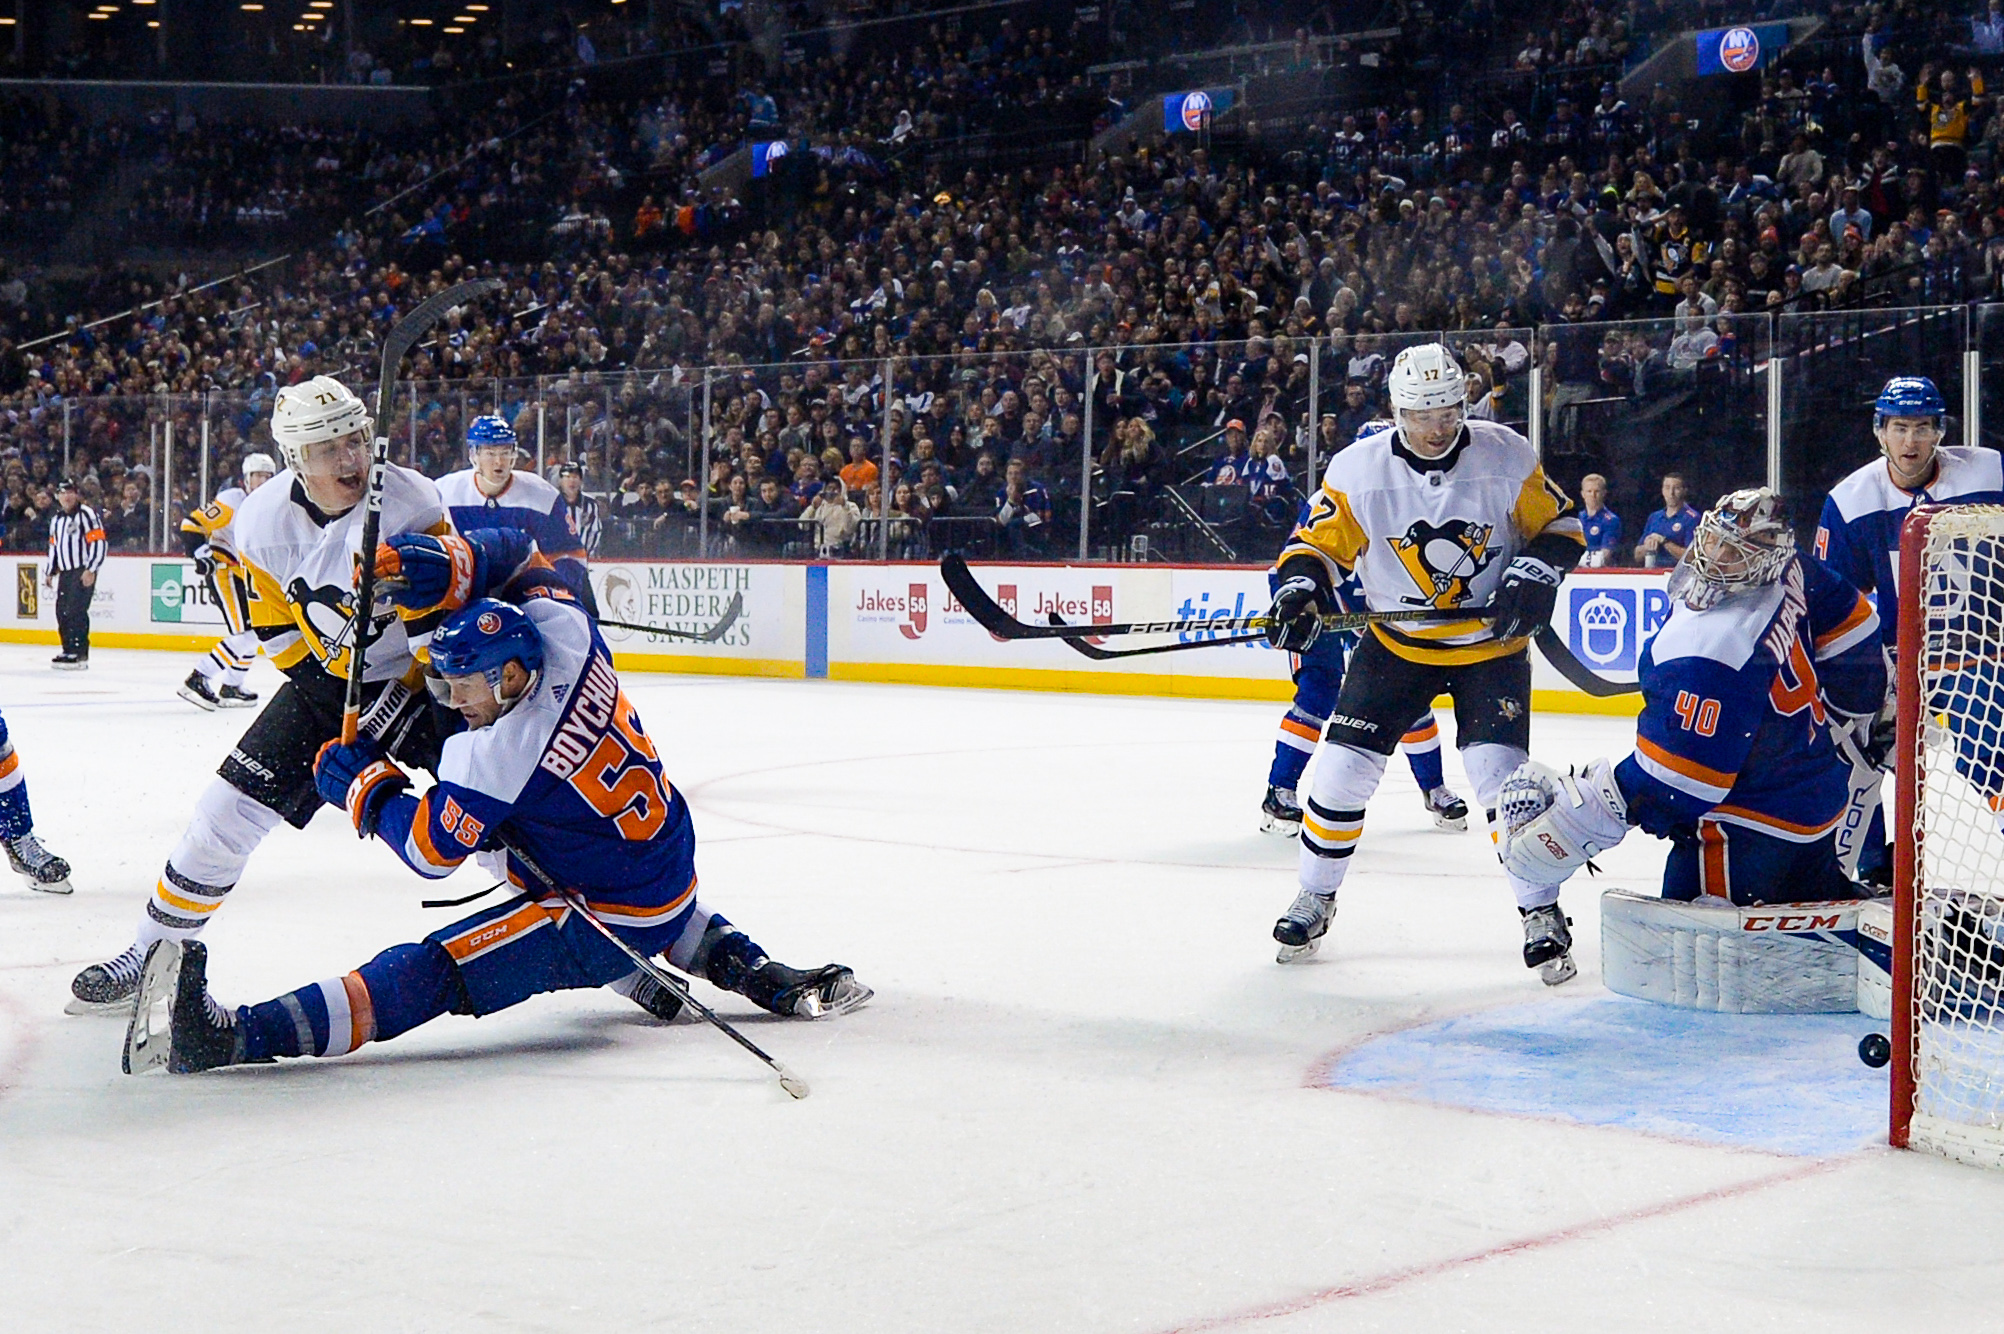 Nov 7, 2019; Brooklyn, NY, USA; Pittsburgh Penguins center Evgeni Malkin (71) scores a goal against New York Islanders defenseman Johnny Boychuk (55) during the third period at Barclays Center. Mandatory Credit: Dennis Schneidler-USA TODAY Sports